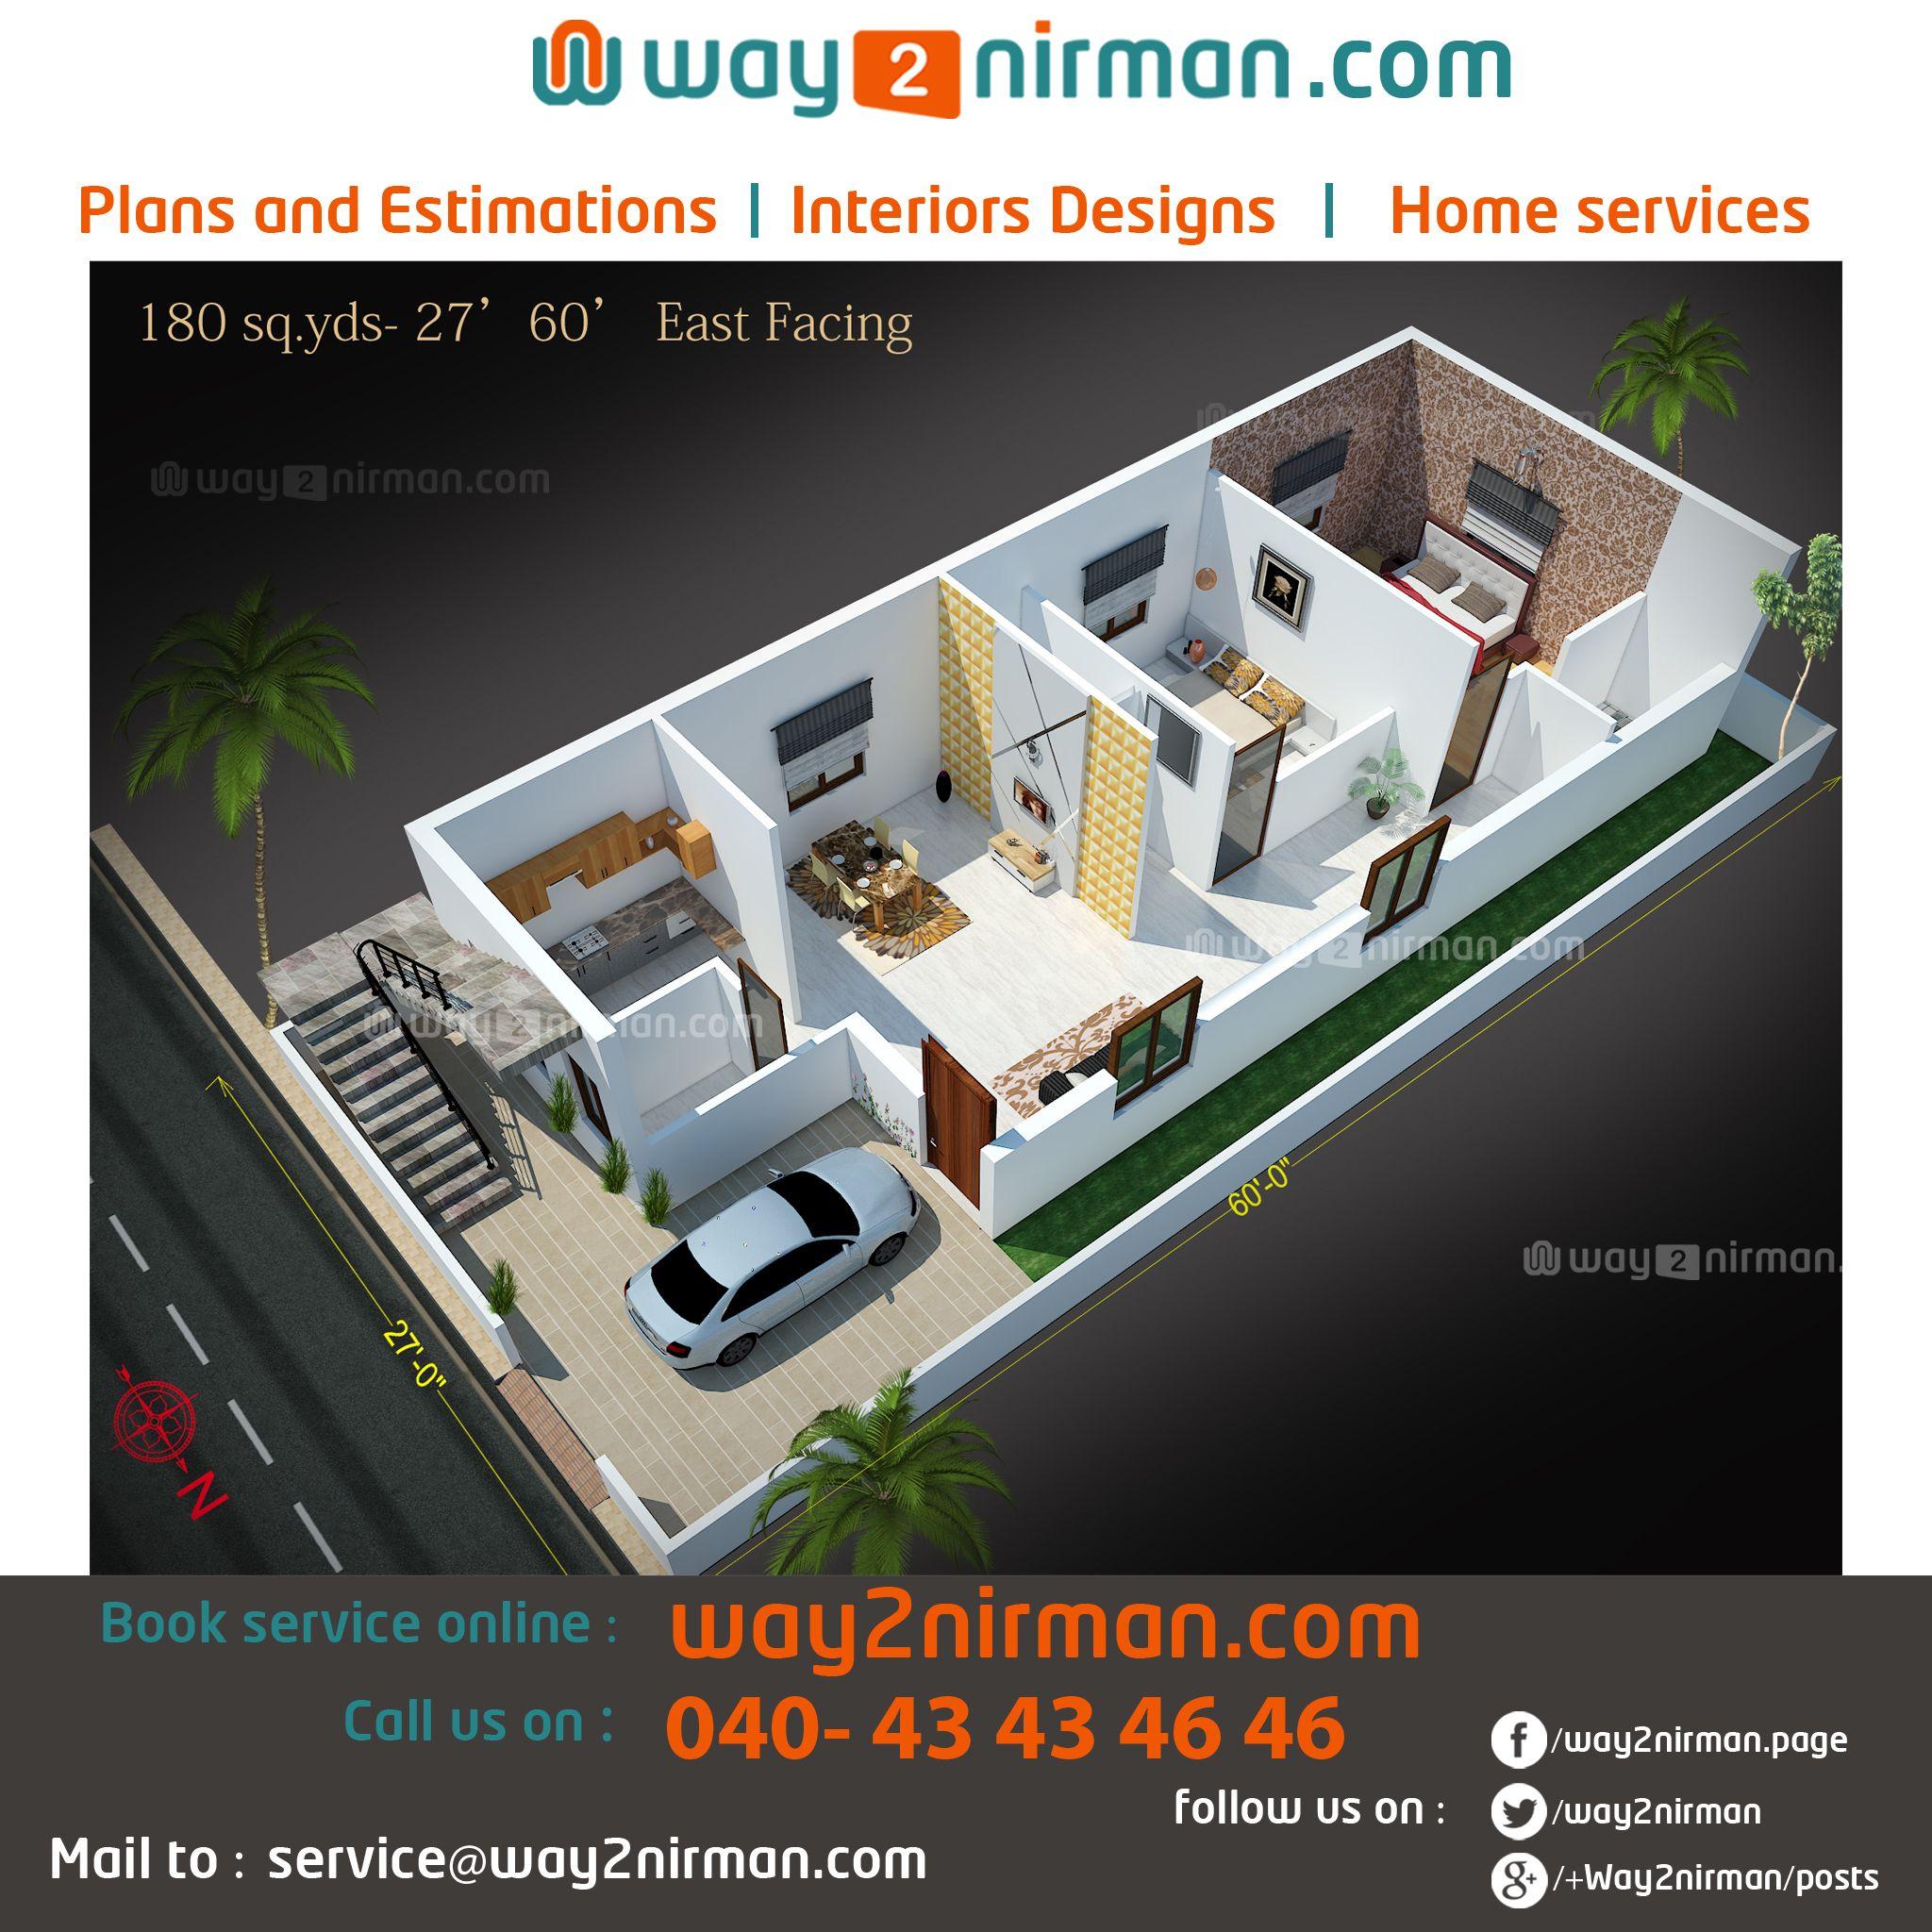 HousePlans # Elevations # BuildingPlans # 3DView ...